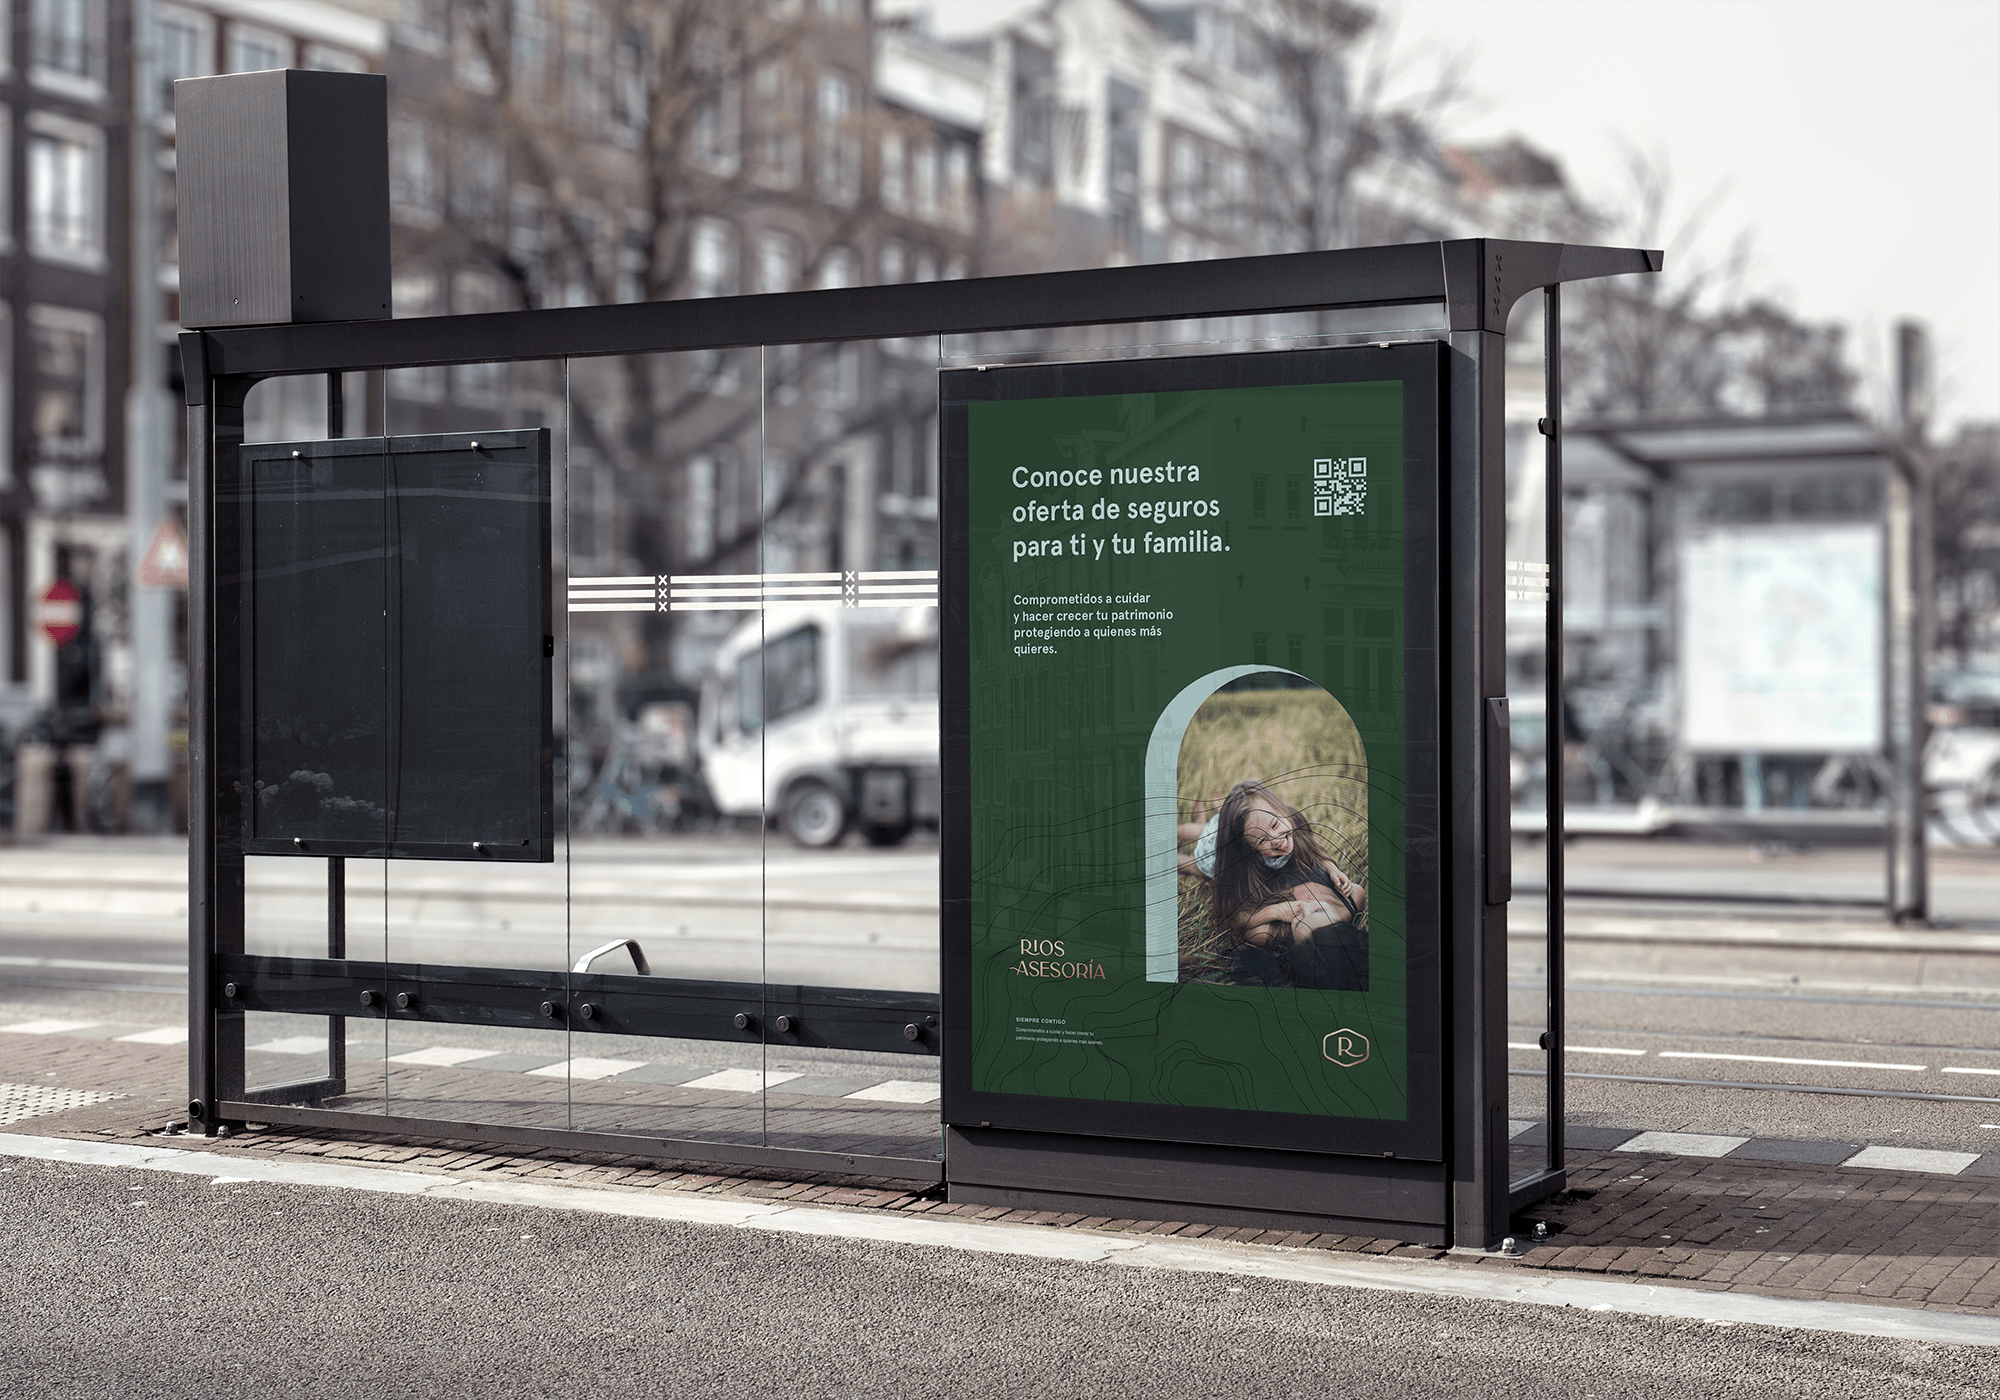 billboard-posts-rios-asesoria-yoenpaperland